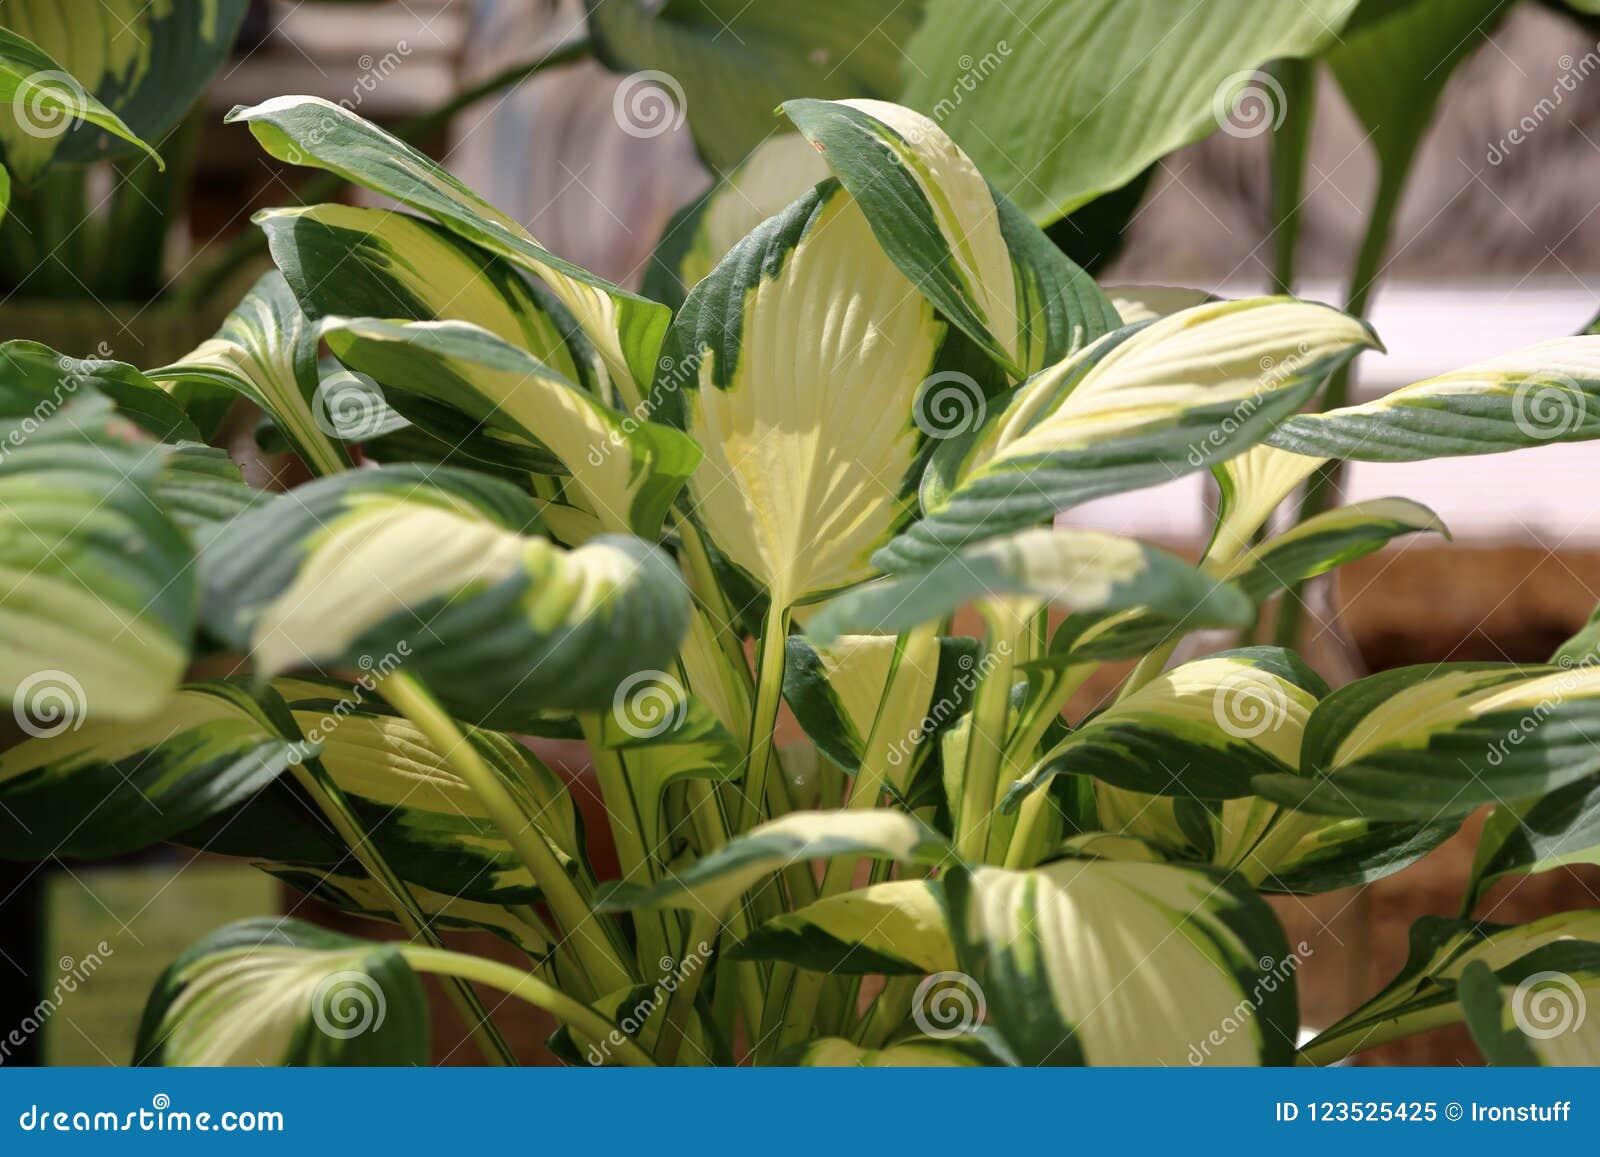 Perennial Plant Hosta Stock Image Image Of Background 123525425